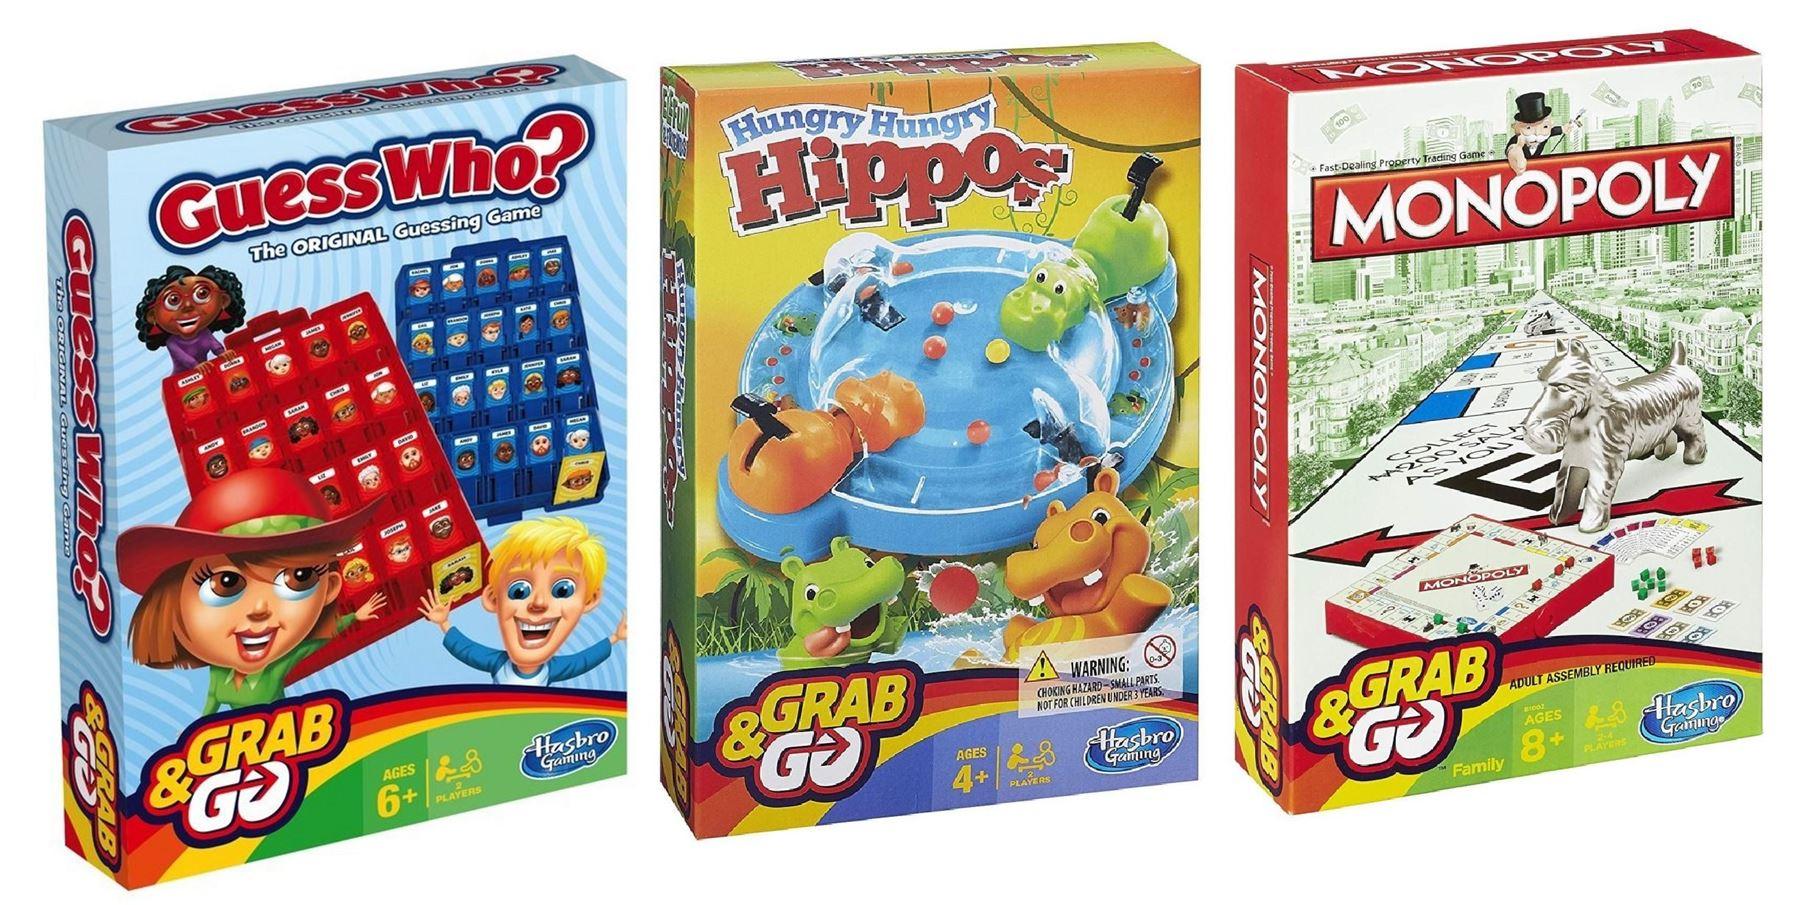 connect 4 ou cluedo game board devinez qui? Hasbro travel jeux monopoly